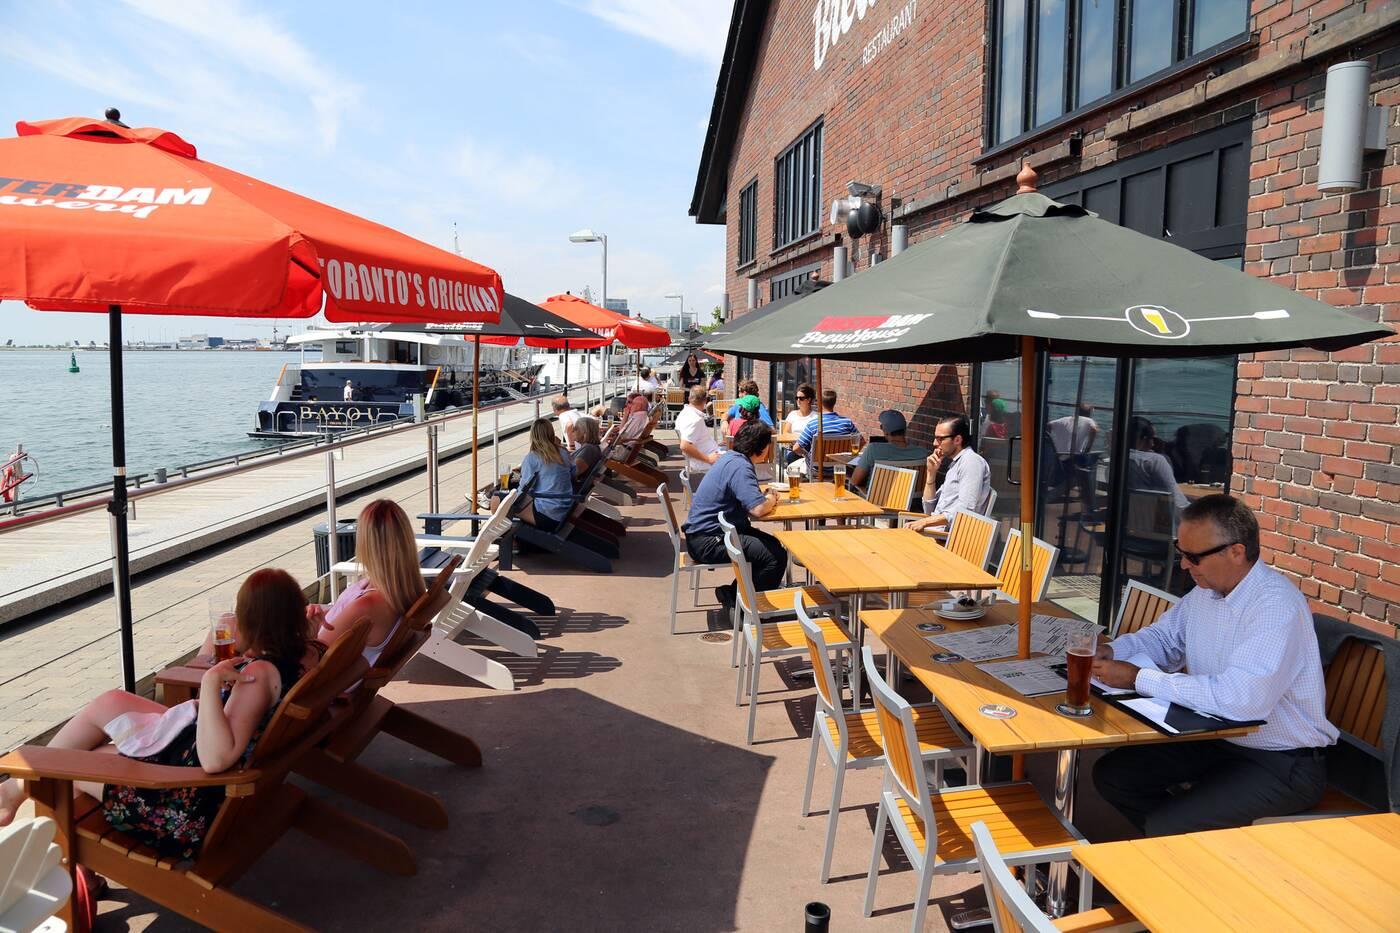 Restaurant Furniture Toronto Ontario : The best patios in toronto